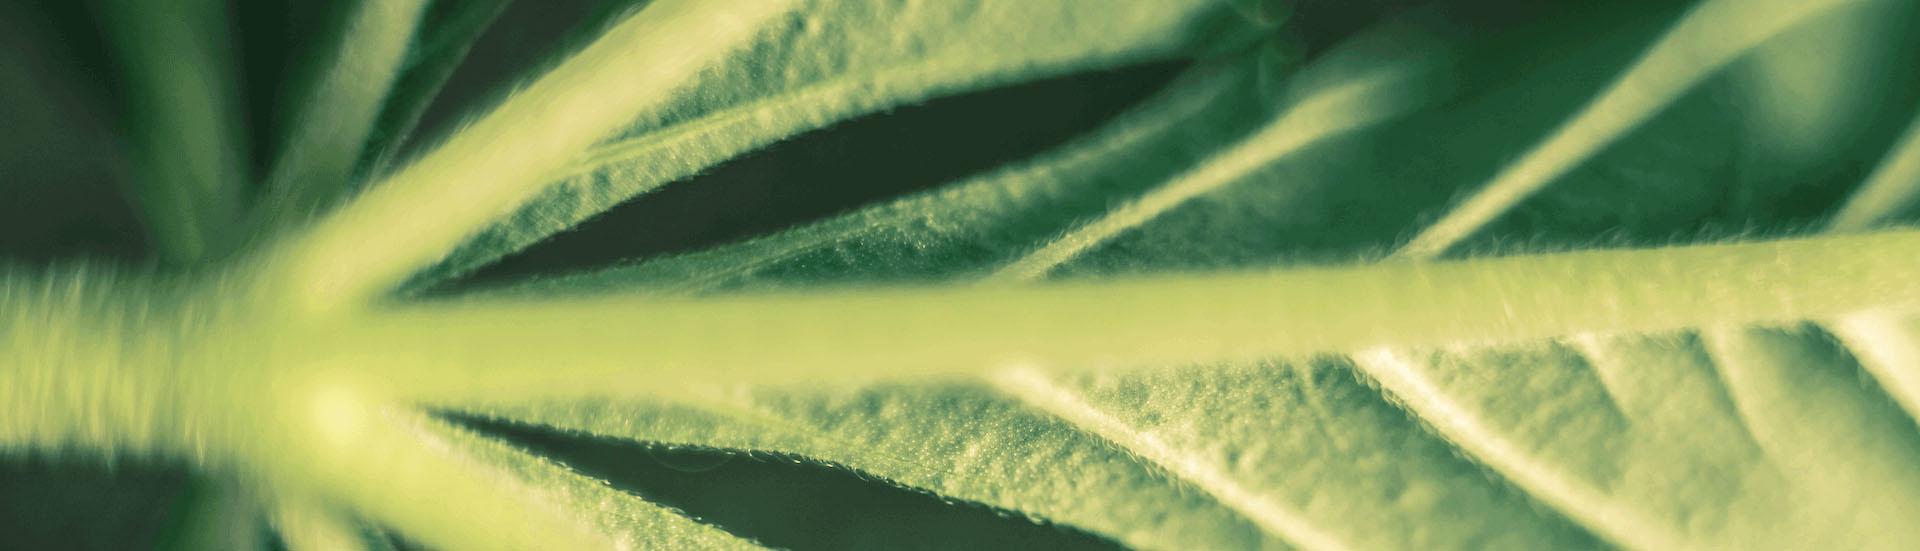 Close up of leaf